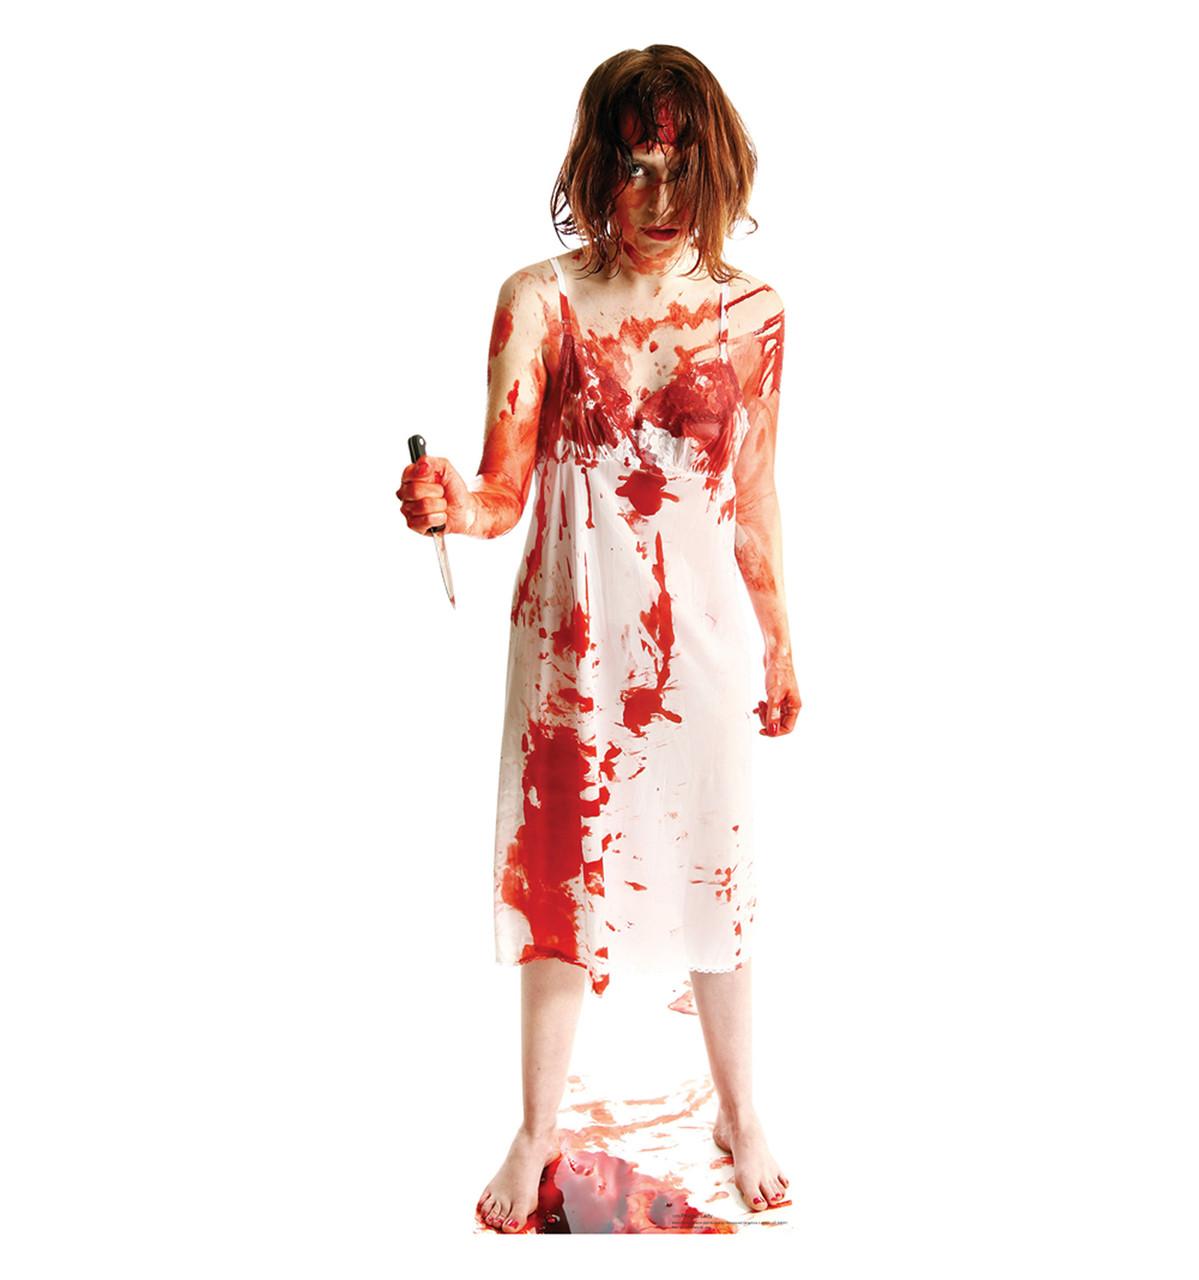 Life-size Psycho Lady Cardboard Standup